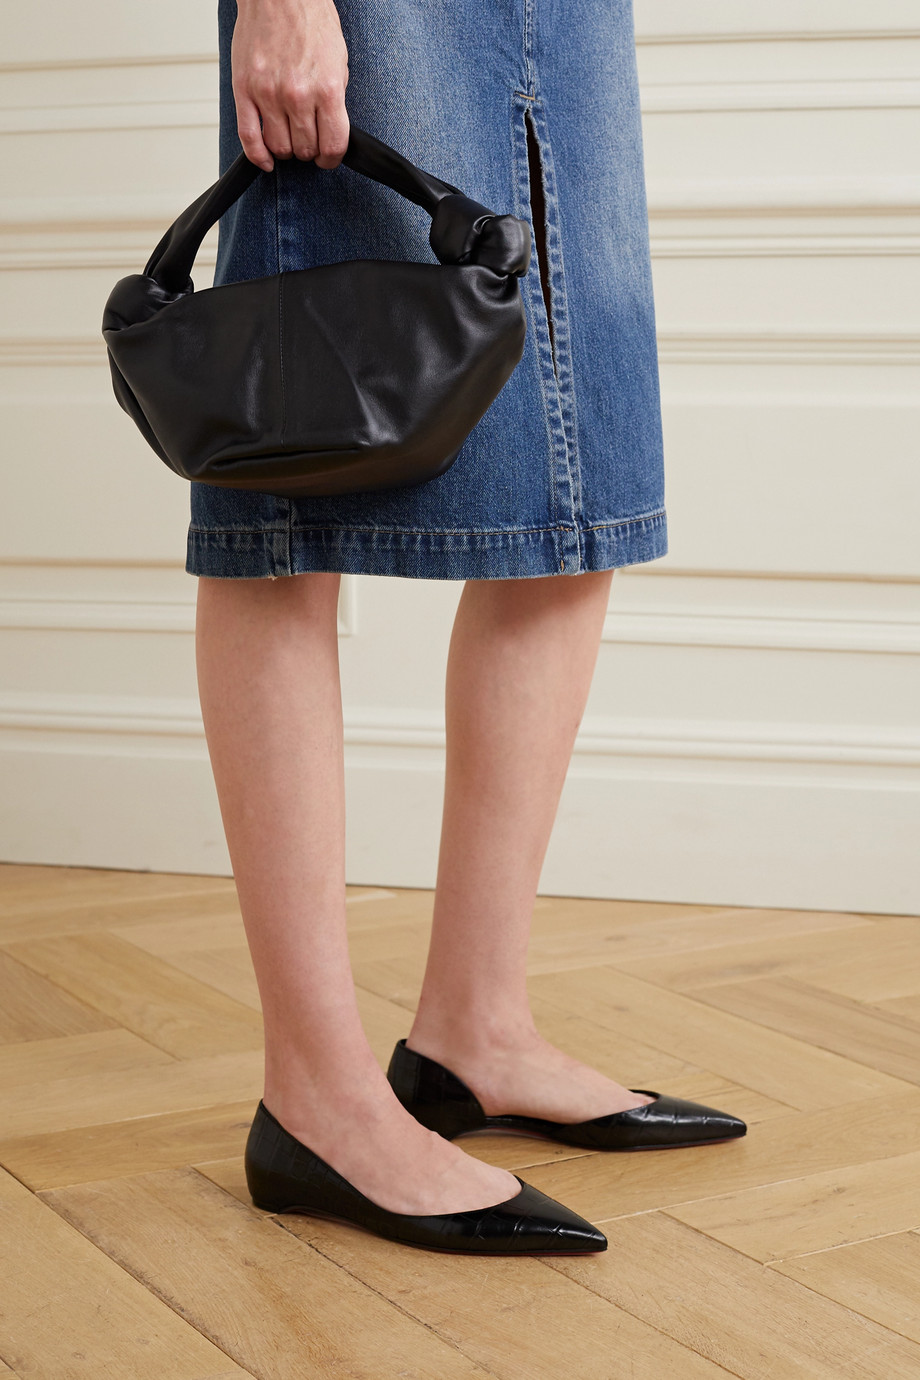 Christian Louboutin Ballerines d'Orsay à bouts pointus en cuir effet croco Iriza